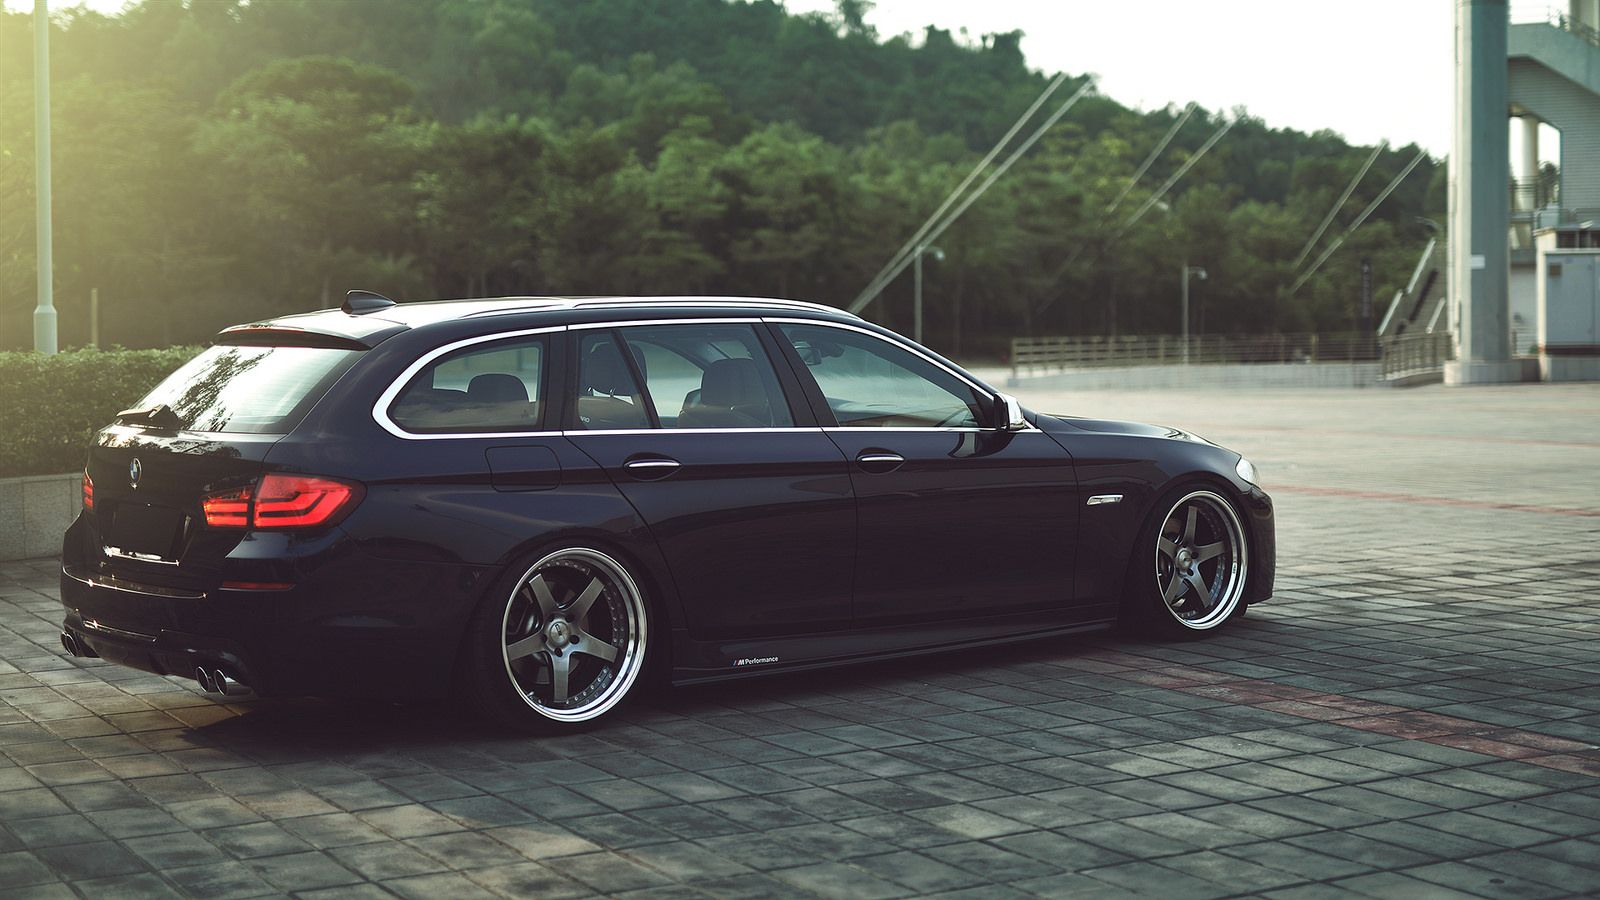 BMW F11 530i touring Bmw wagon, Bmw touring, Bmw convertible